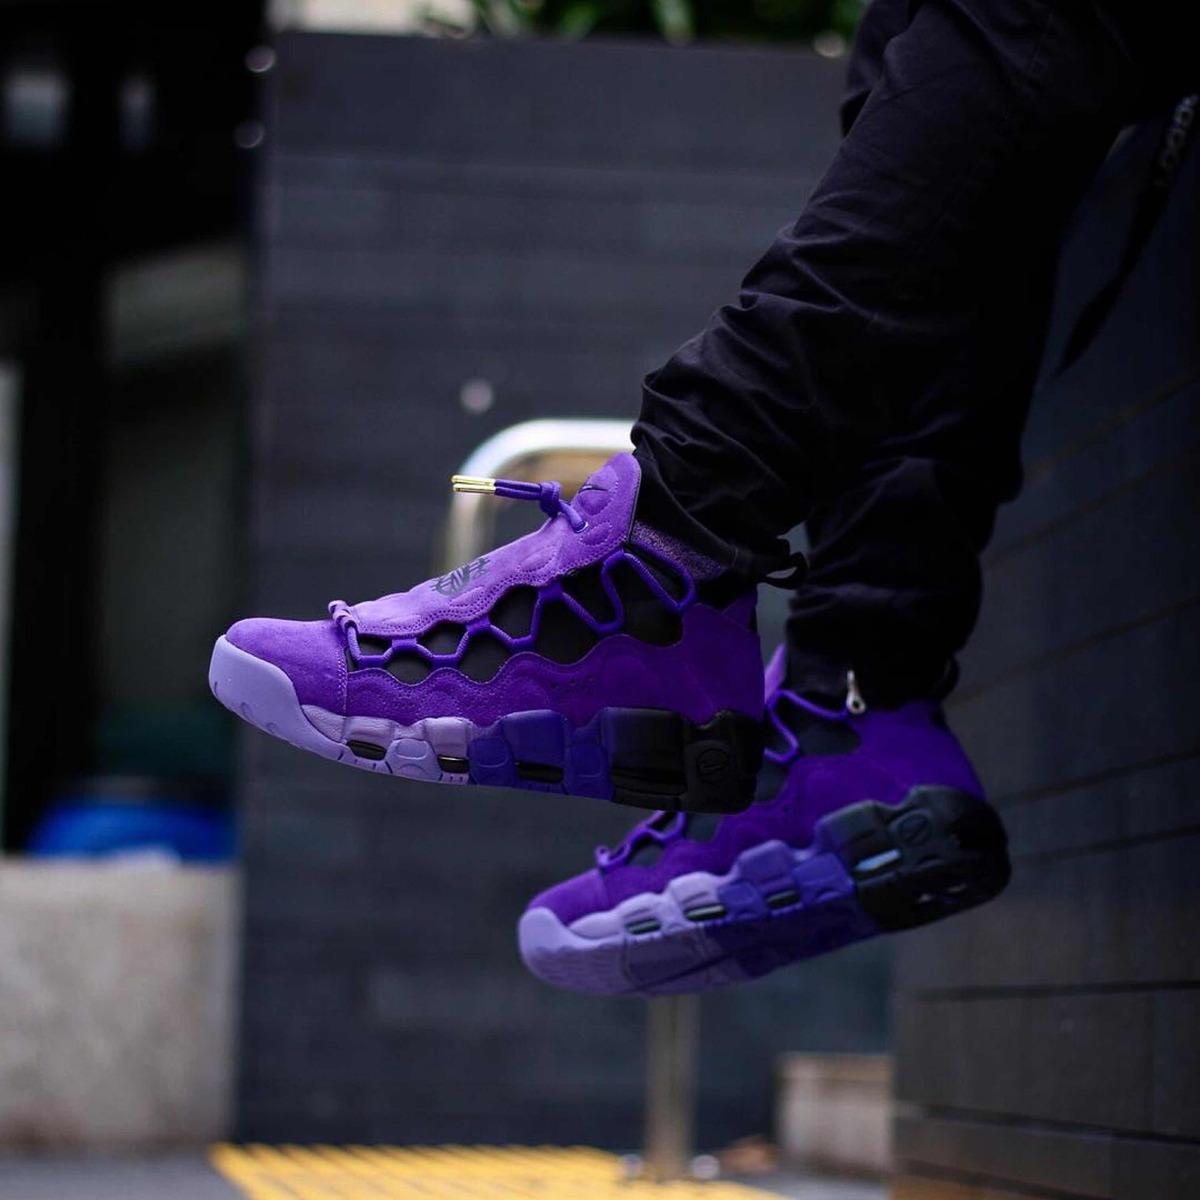 45a3ce520 nike air more money qs court purple originales envío gratis. Cargando zoom.